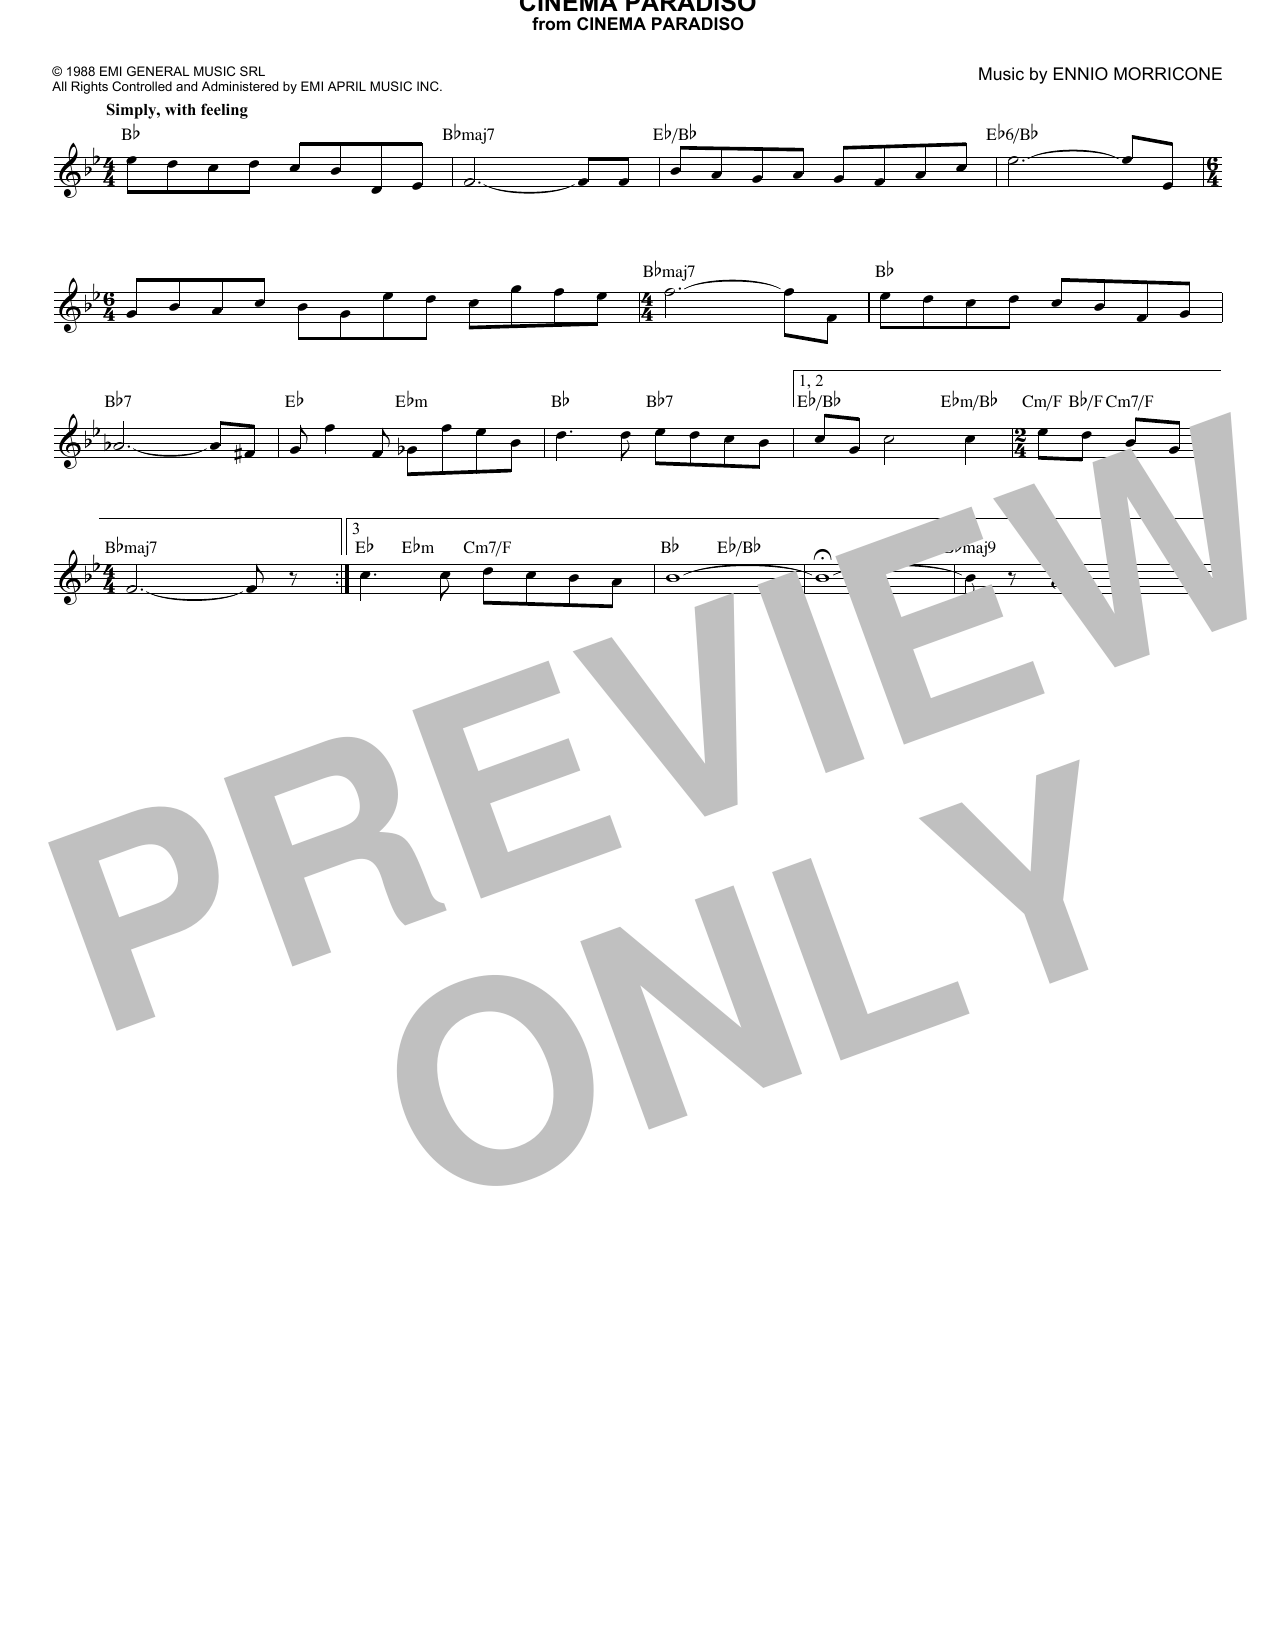 Cinema Paradiso Sheet Music